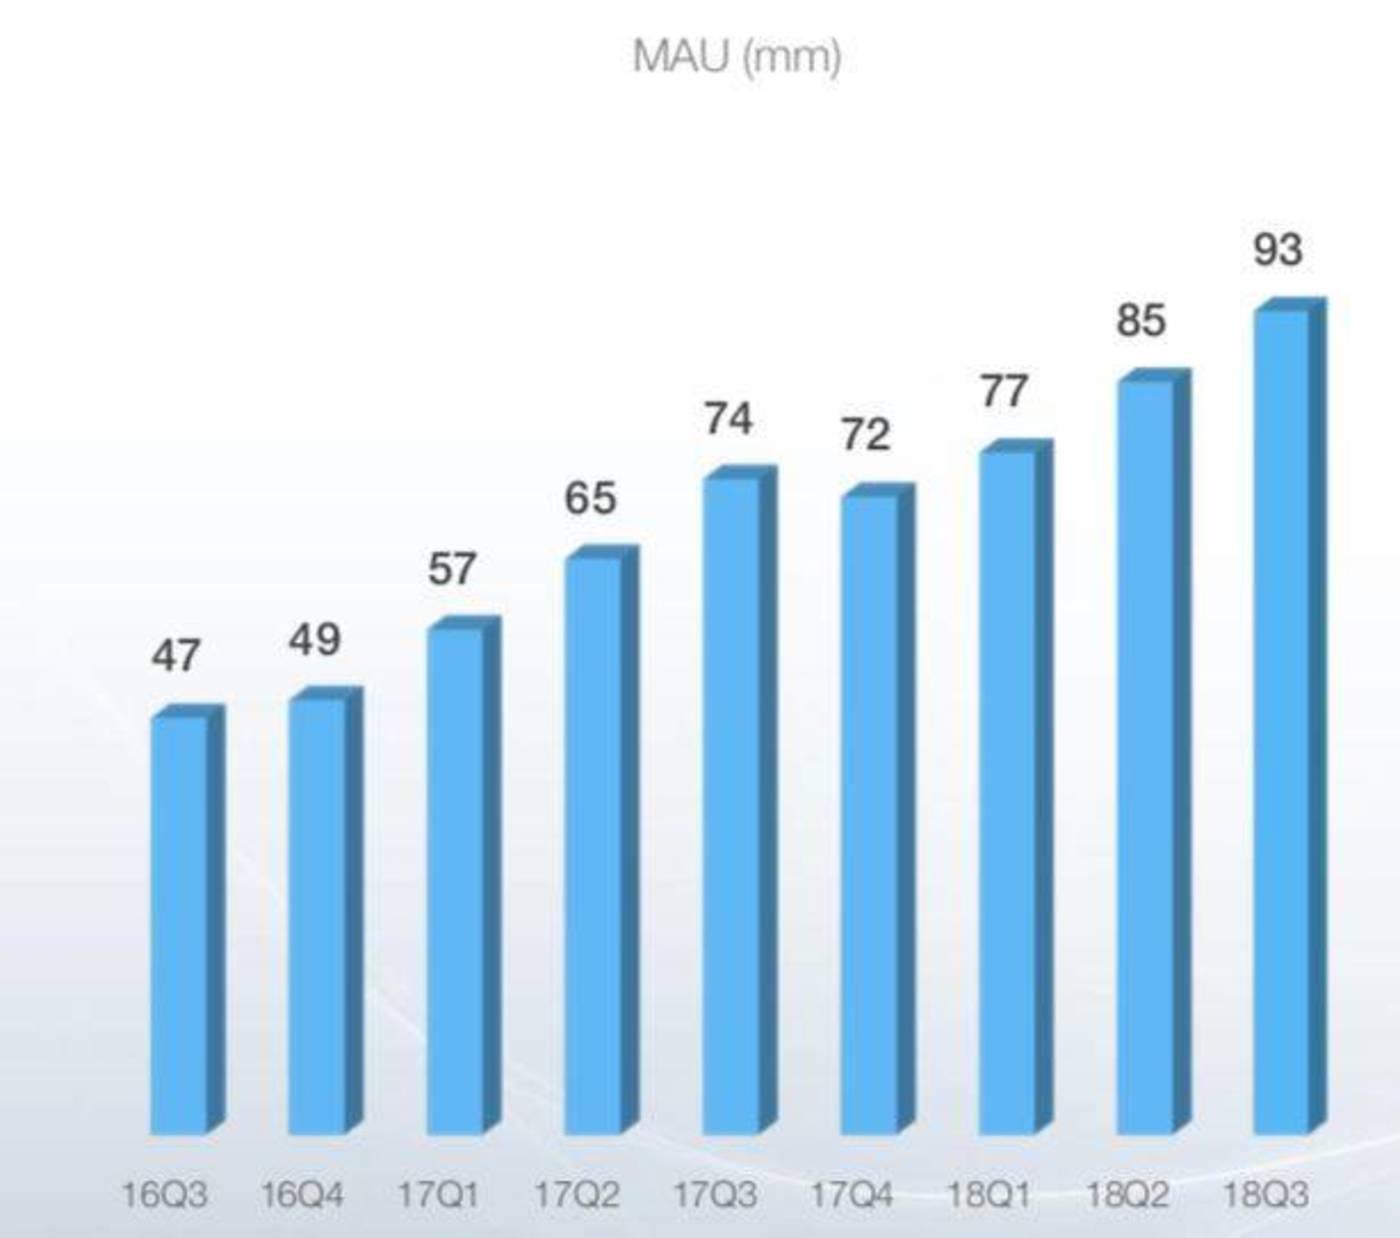 B站MAU增长数据来源:B站三季报